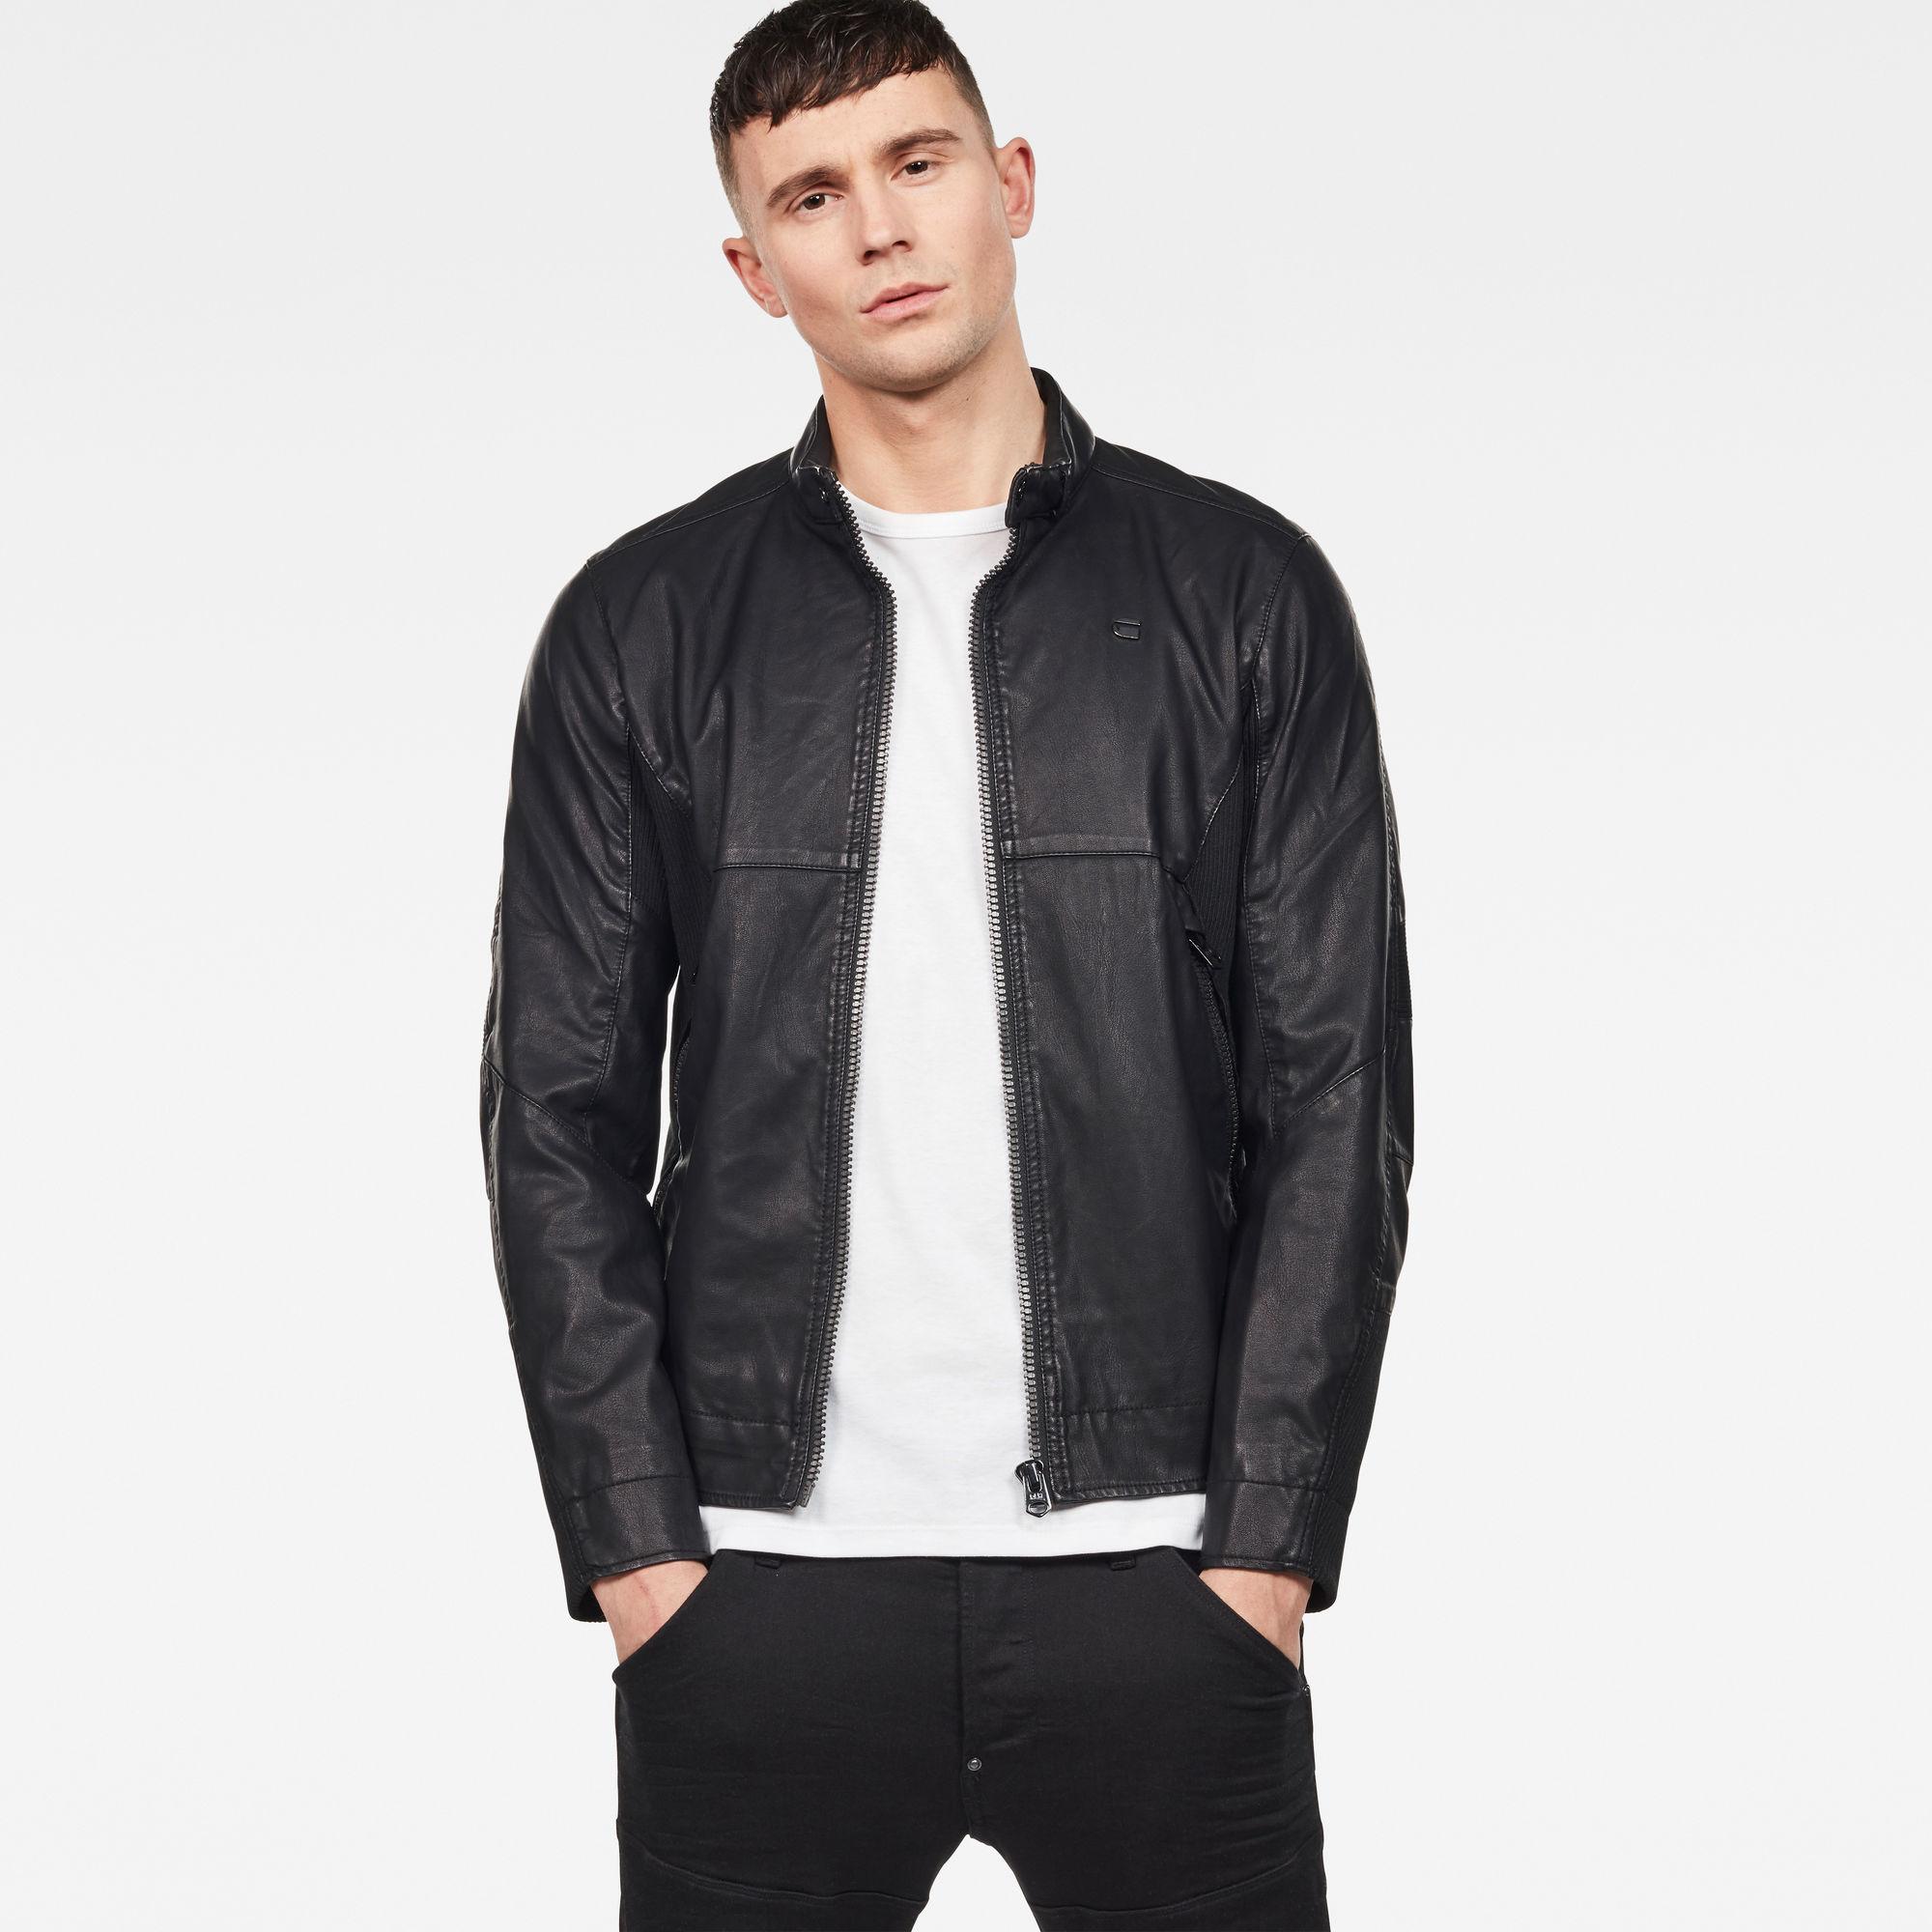 Motac-X GPL Biker Jacket